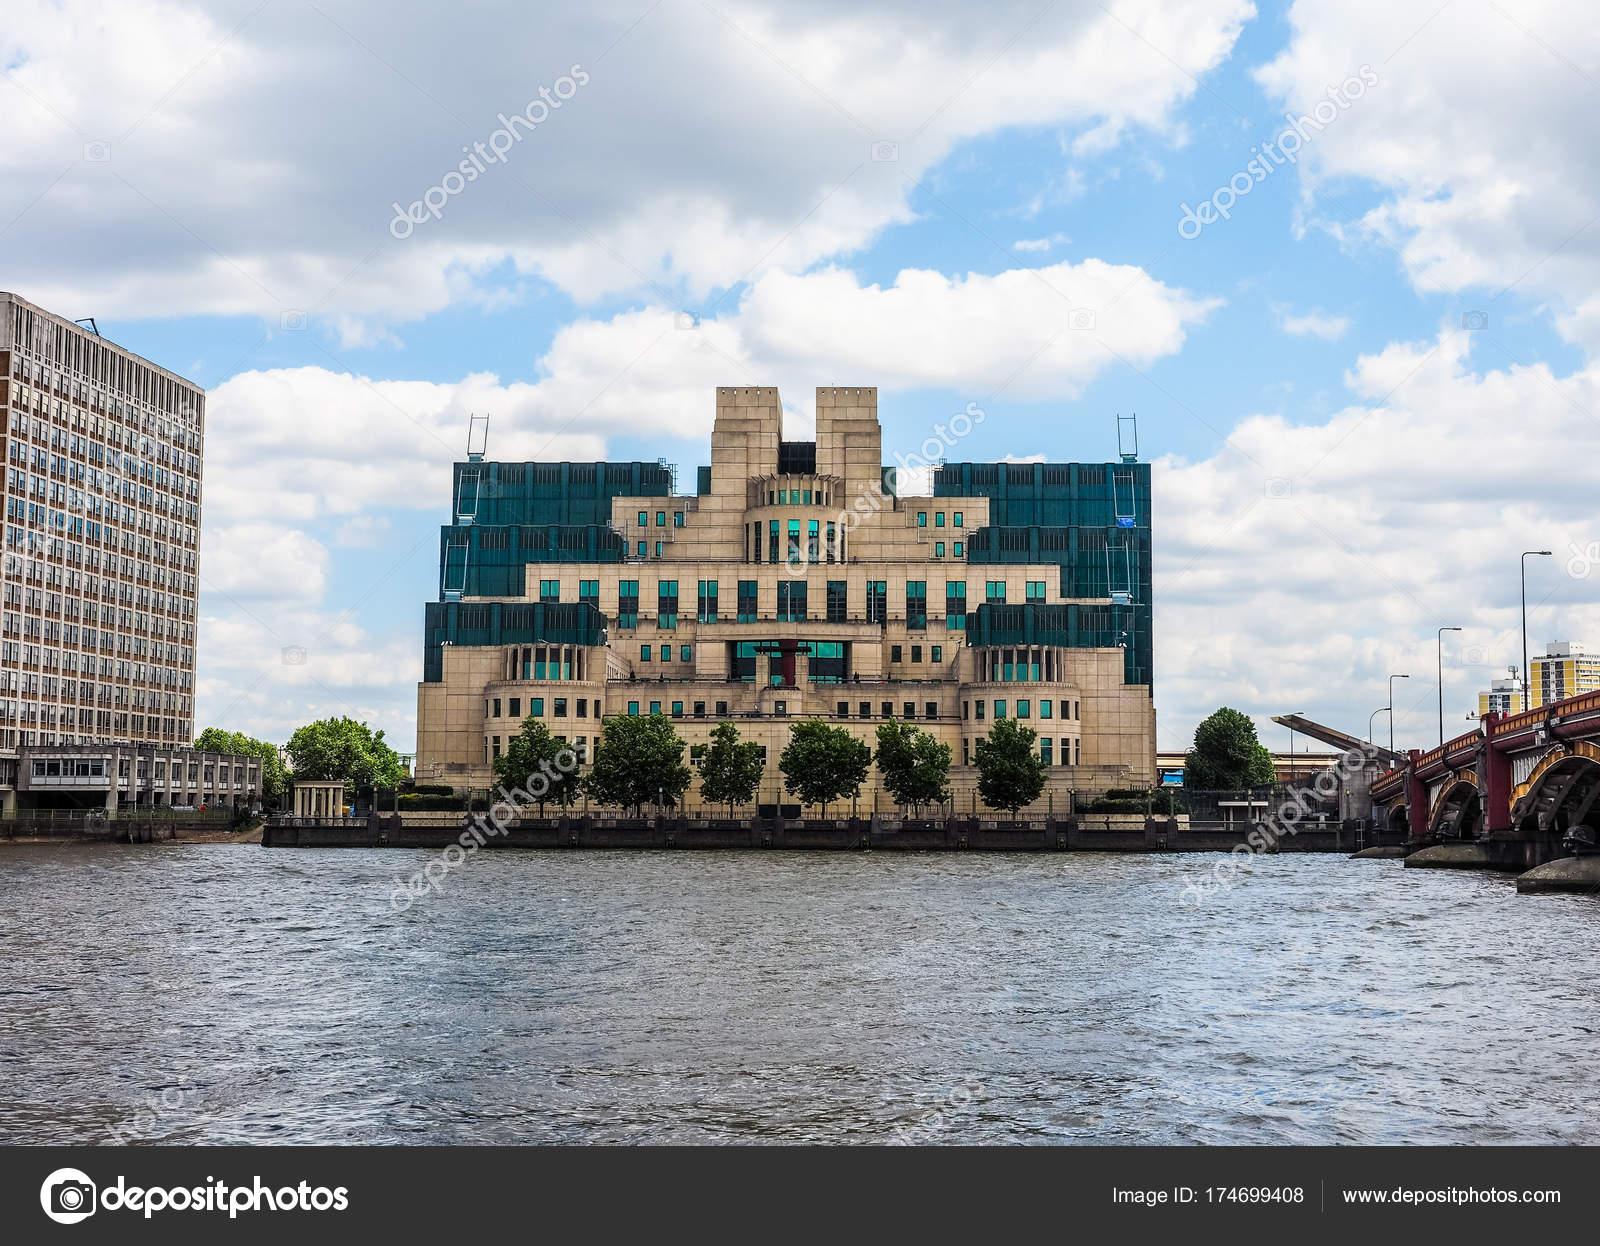 Google Hoofdkwartier Londen : Britse geheime dienst in londen hdr u2013 redactionele stockfoto